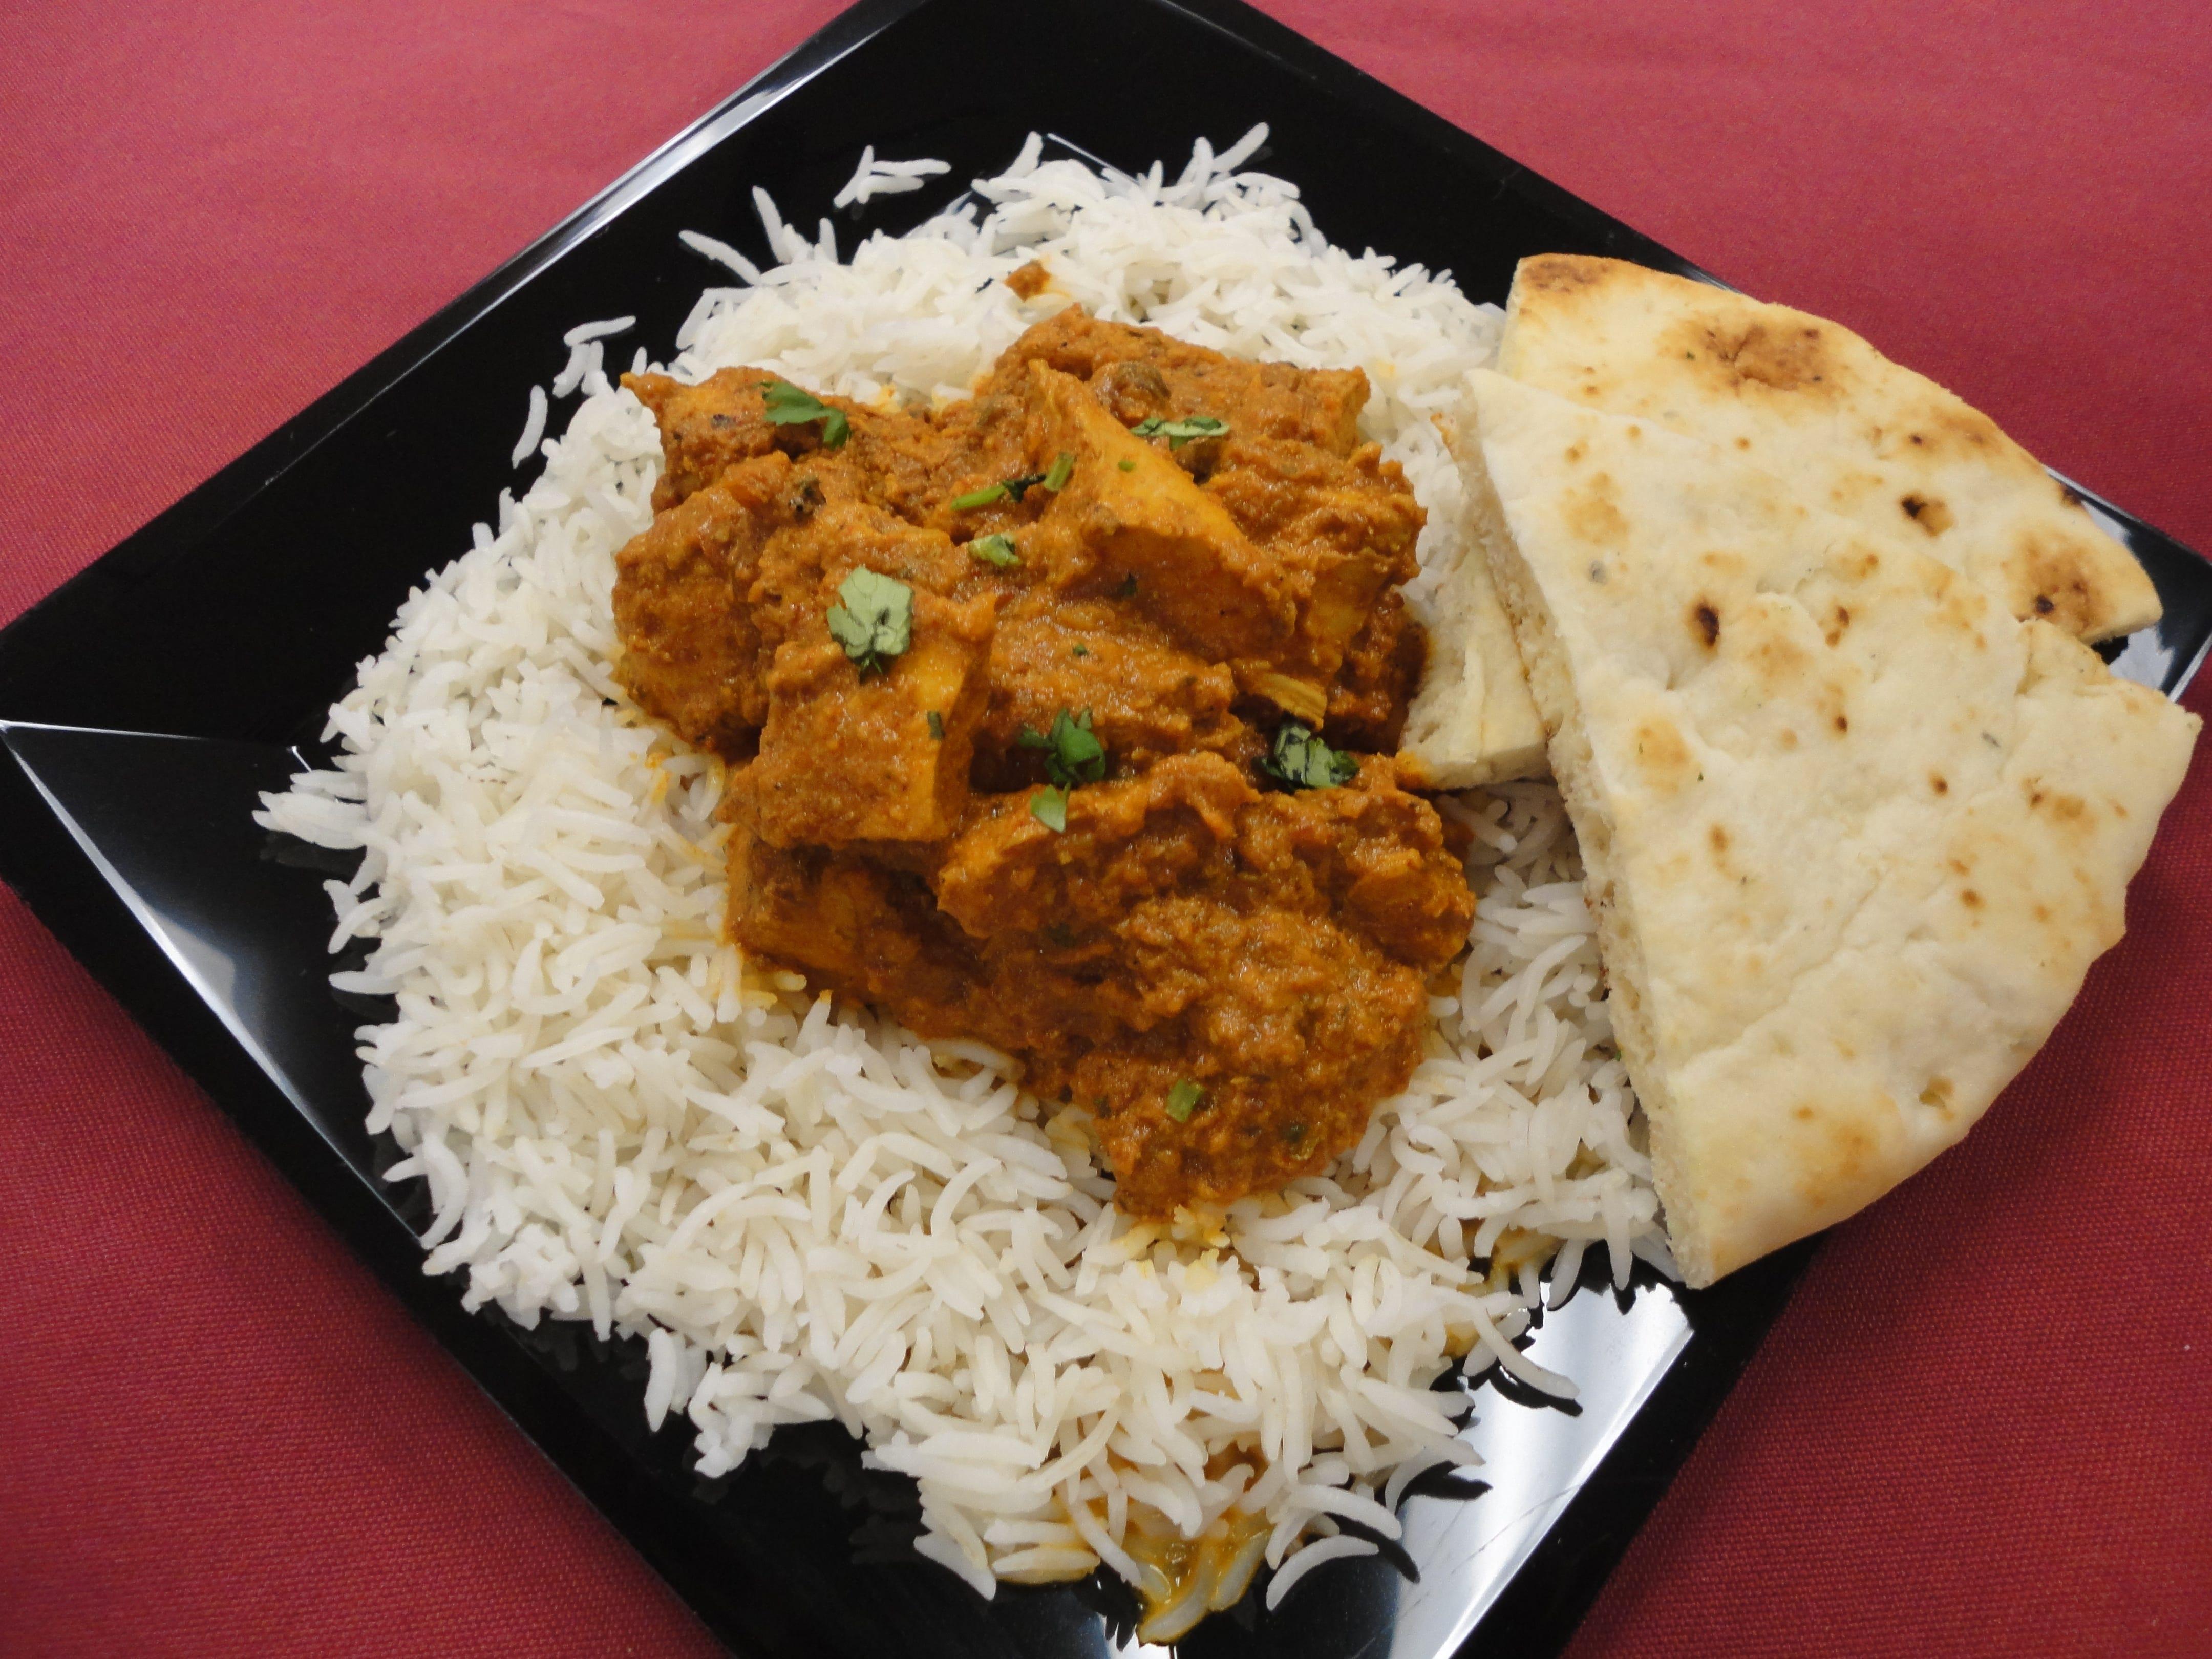 626fc93f-ffa3-4815-913f-cc794abf149e-Tikka_Masala_004 Take a culinary tour of India at Florida Tech's International Dinner on Thursday